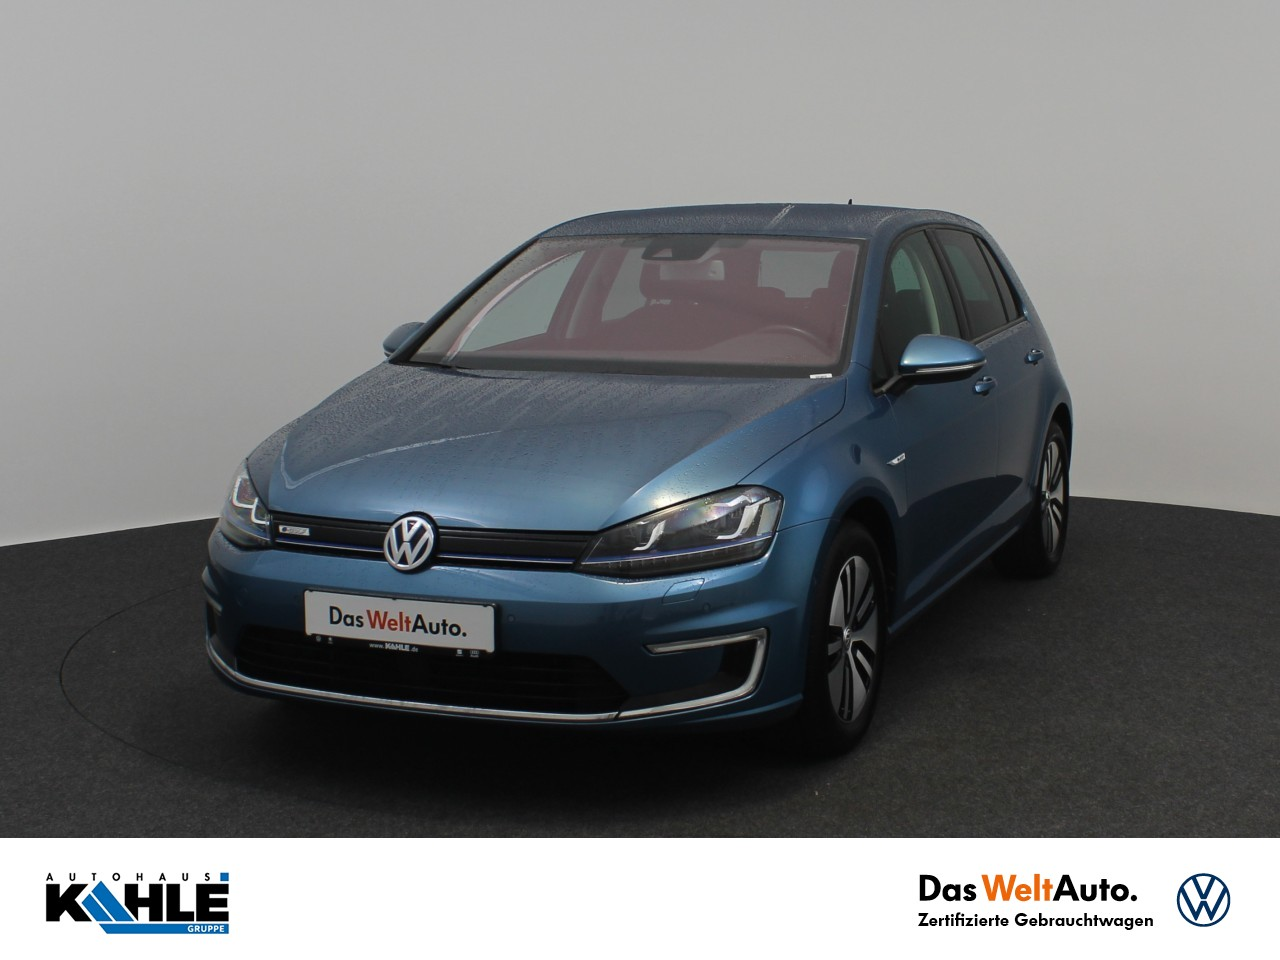 Volkswagen Golf VII e-Golf Navi LED Klima PDC Klima Navi, Jahr 2017, Elektro